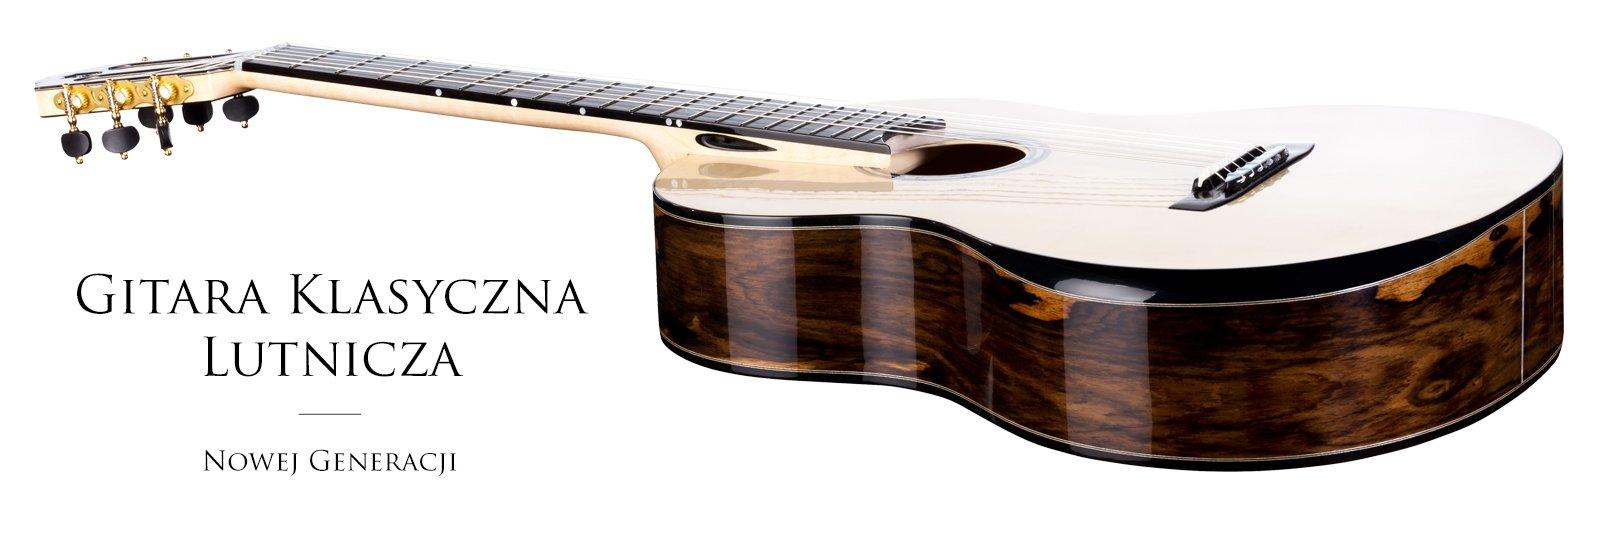 Gitara Klasyczna Lutnicza